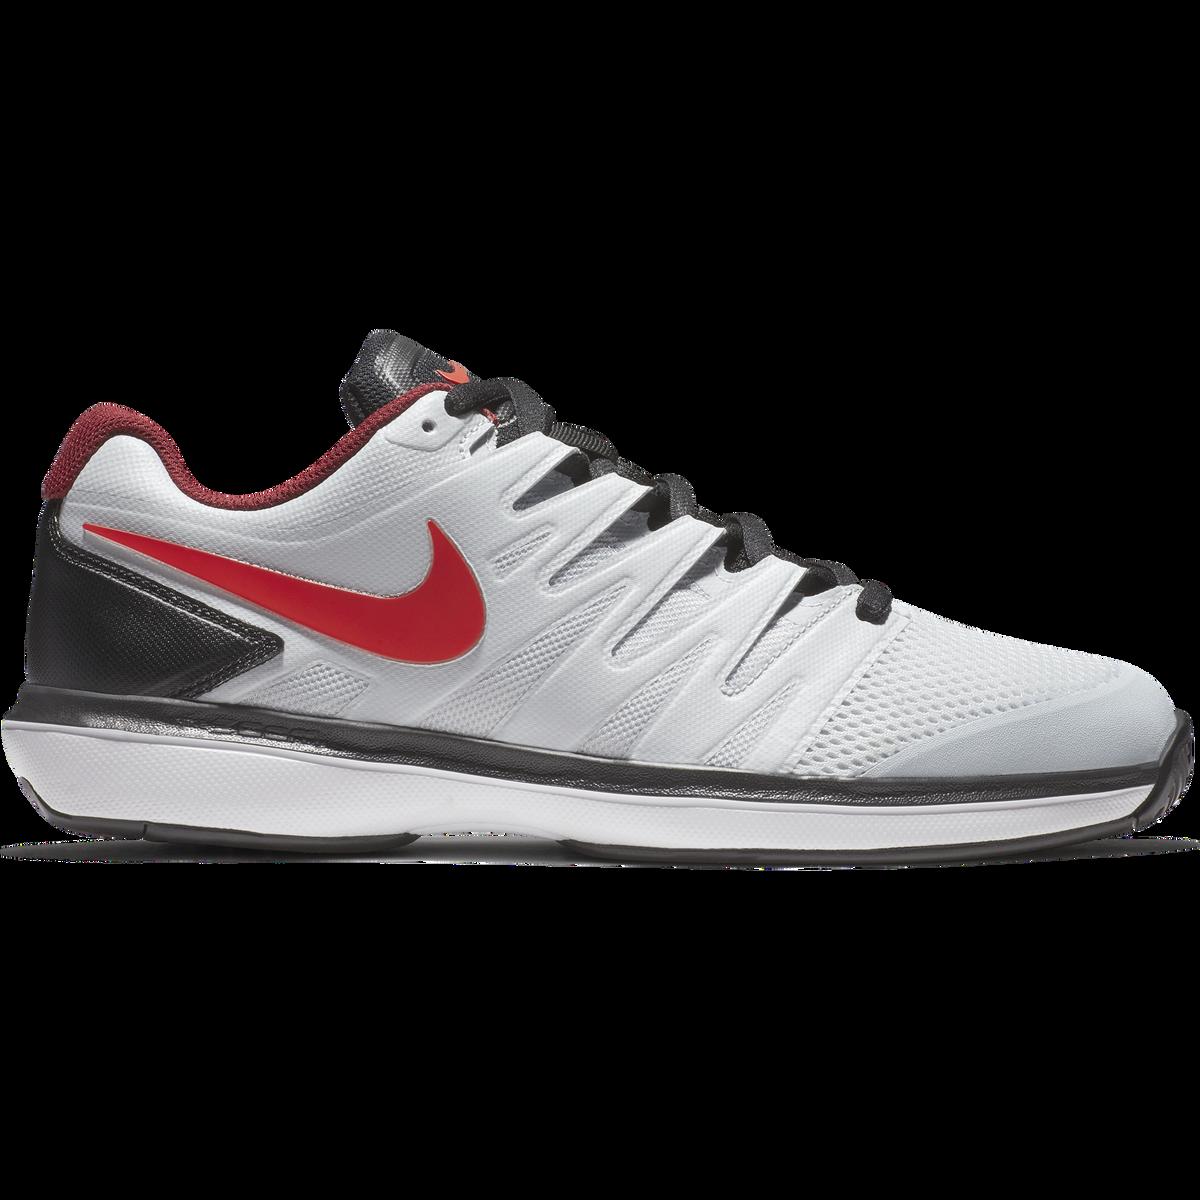 18a52d0eeaa Nike Air Zoom Prestige Men s Tennis Shoe - Light Grey